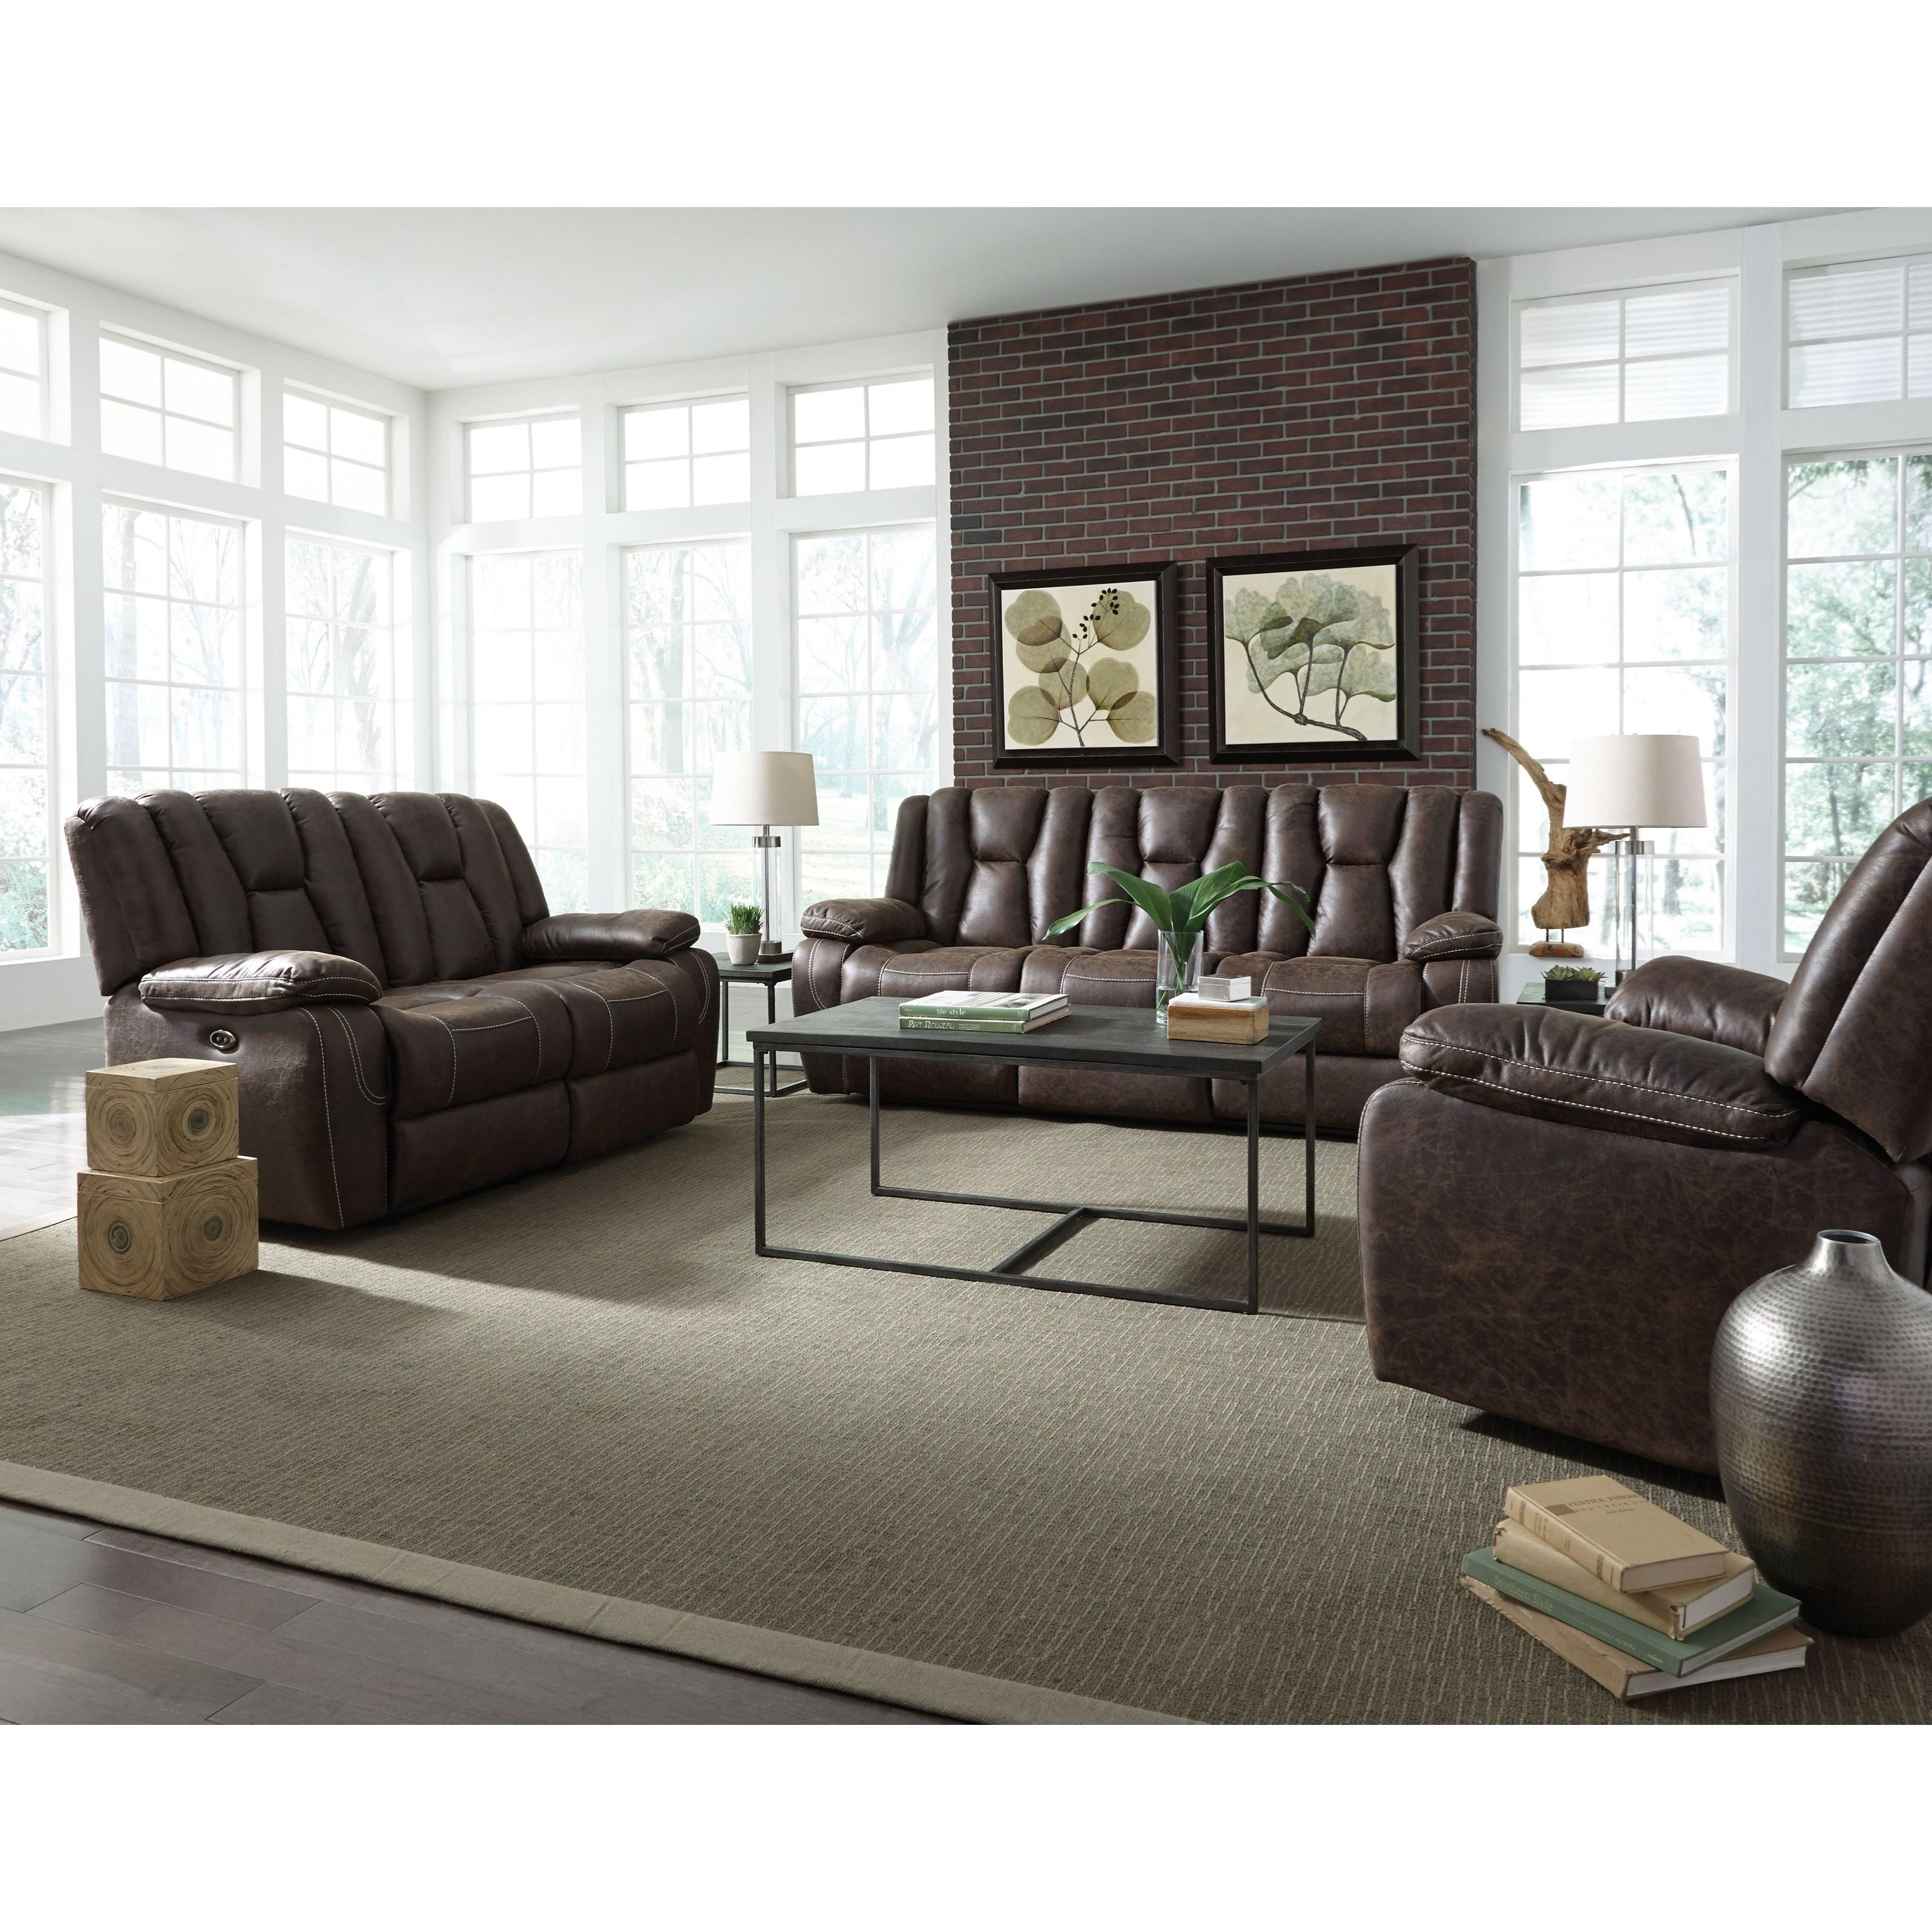 Standard Furniture Rainier Reclining Living Room Group Jacksonville Furniture Mart Reclining